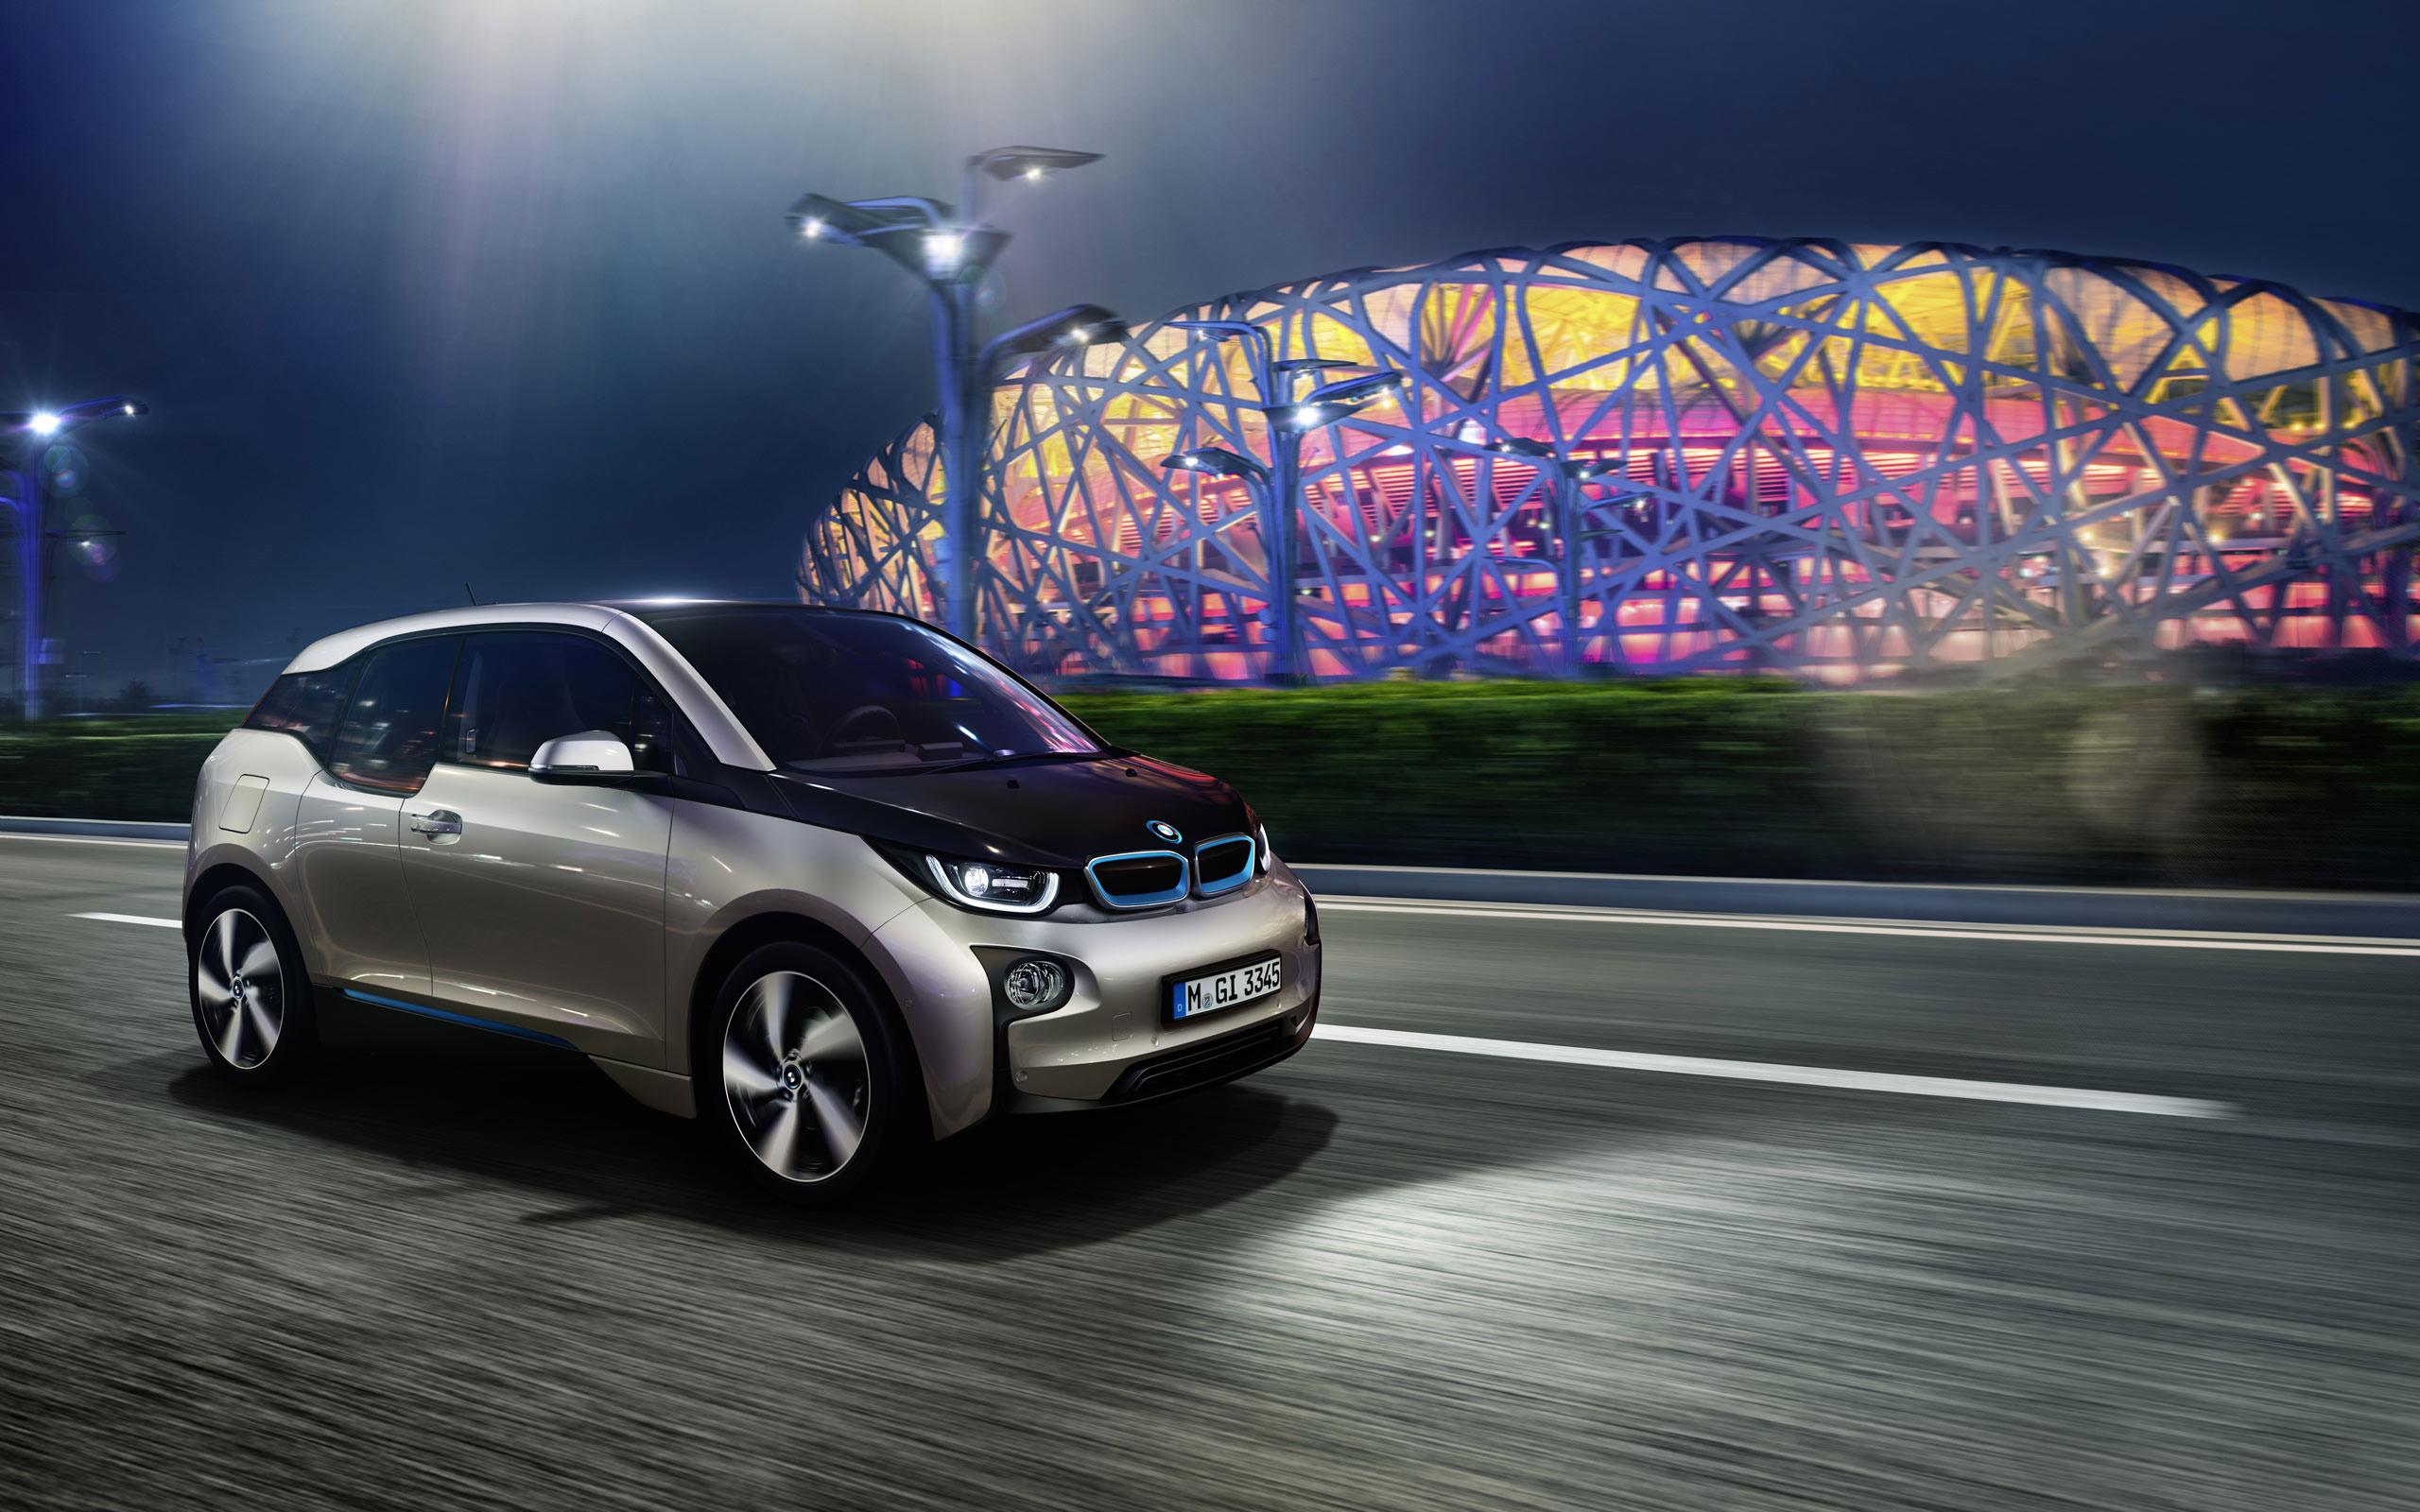 BMW i3 2014 Wallpaper | HD Car Wallpapers | ID #3601